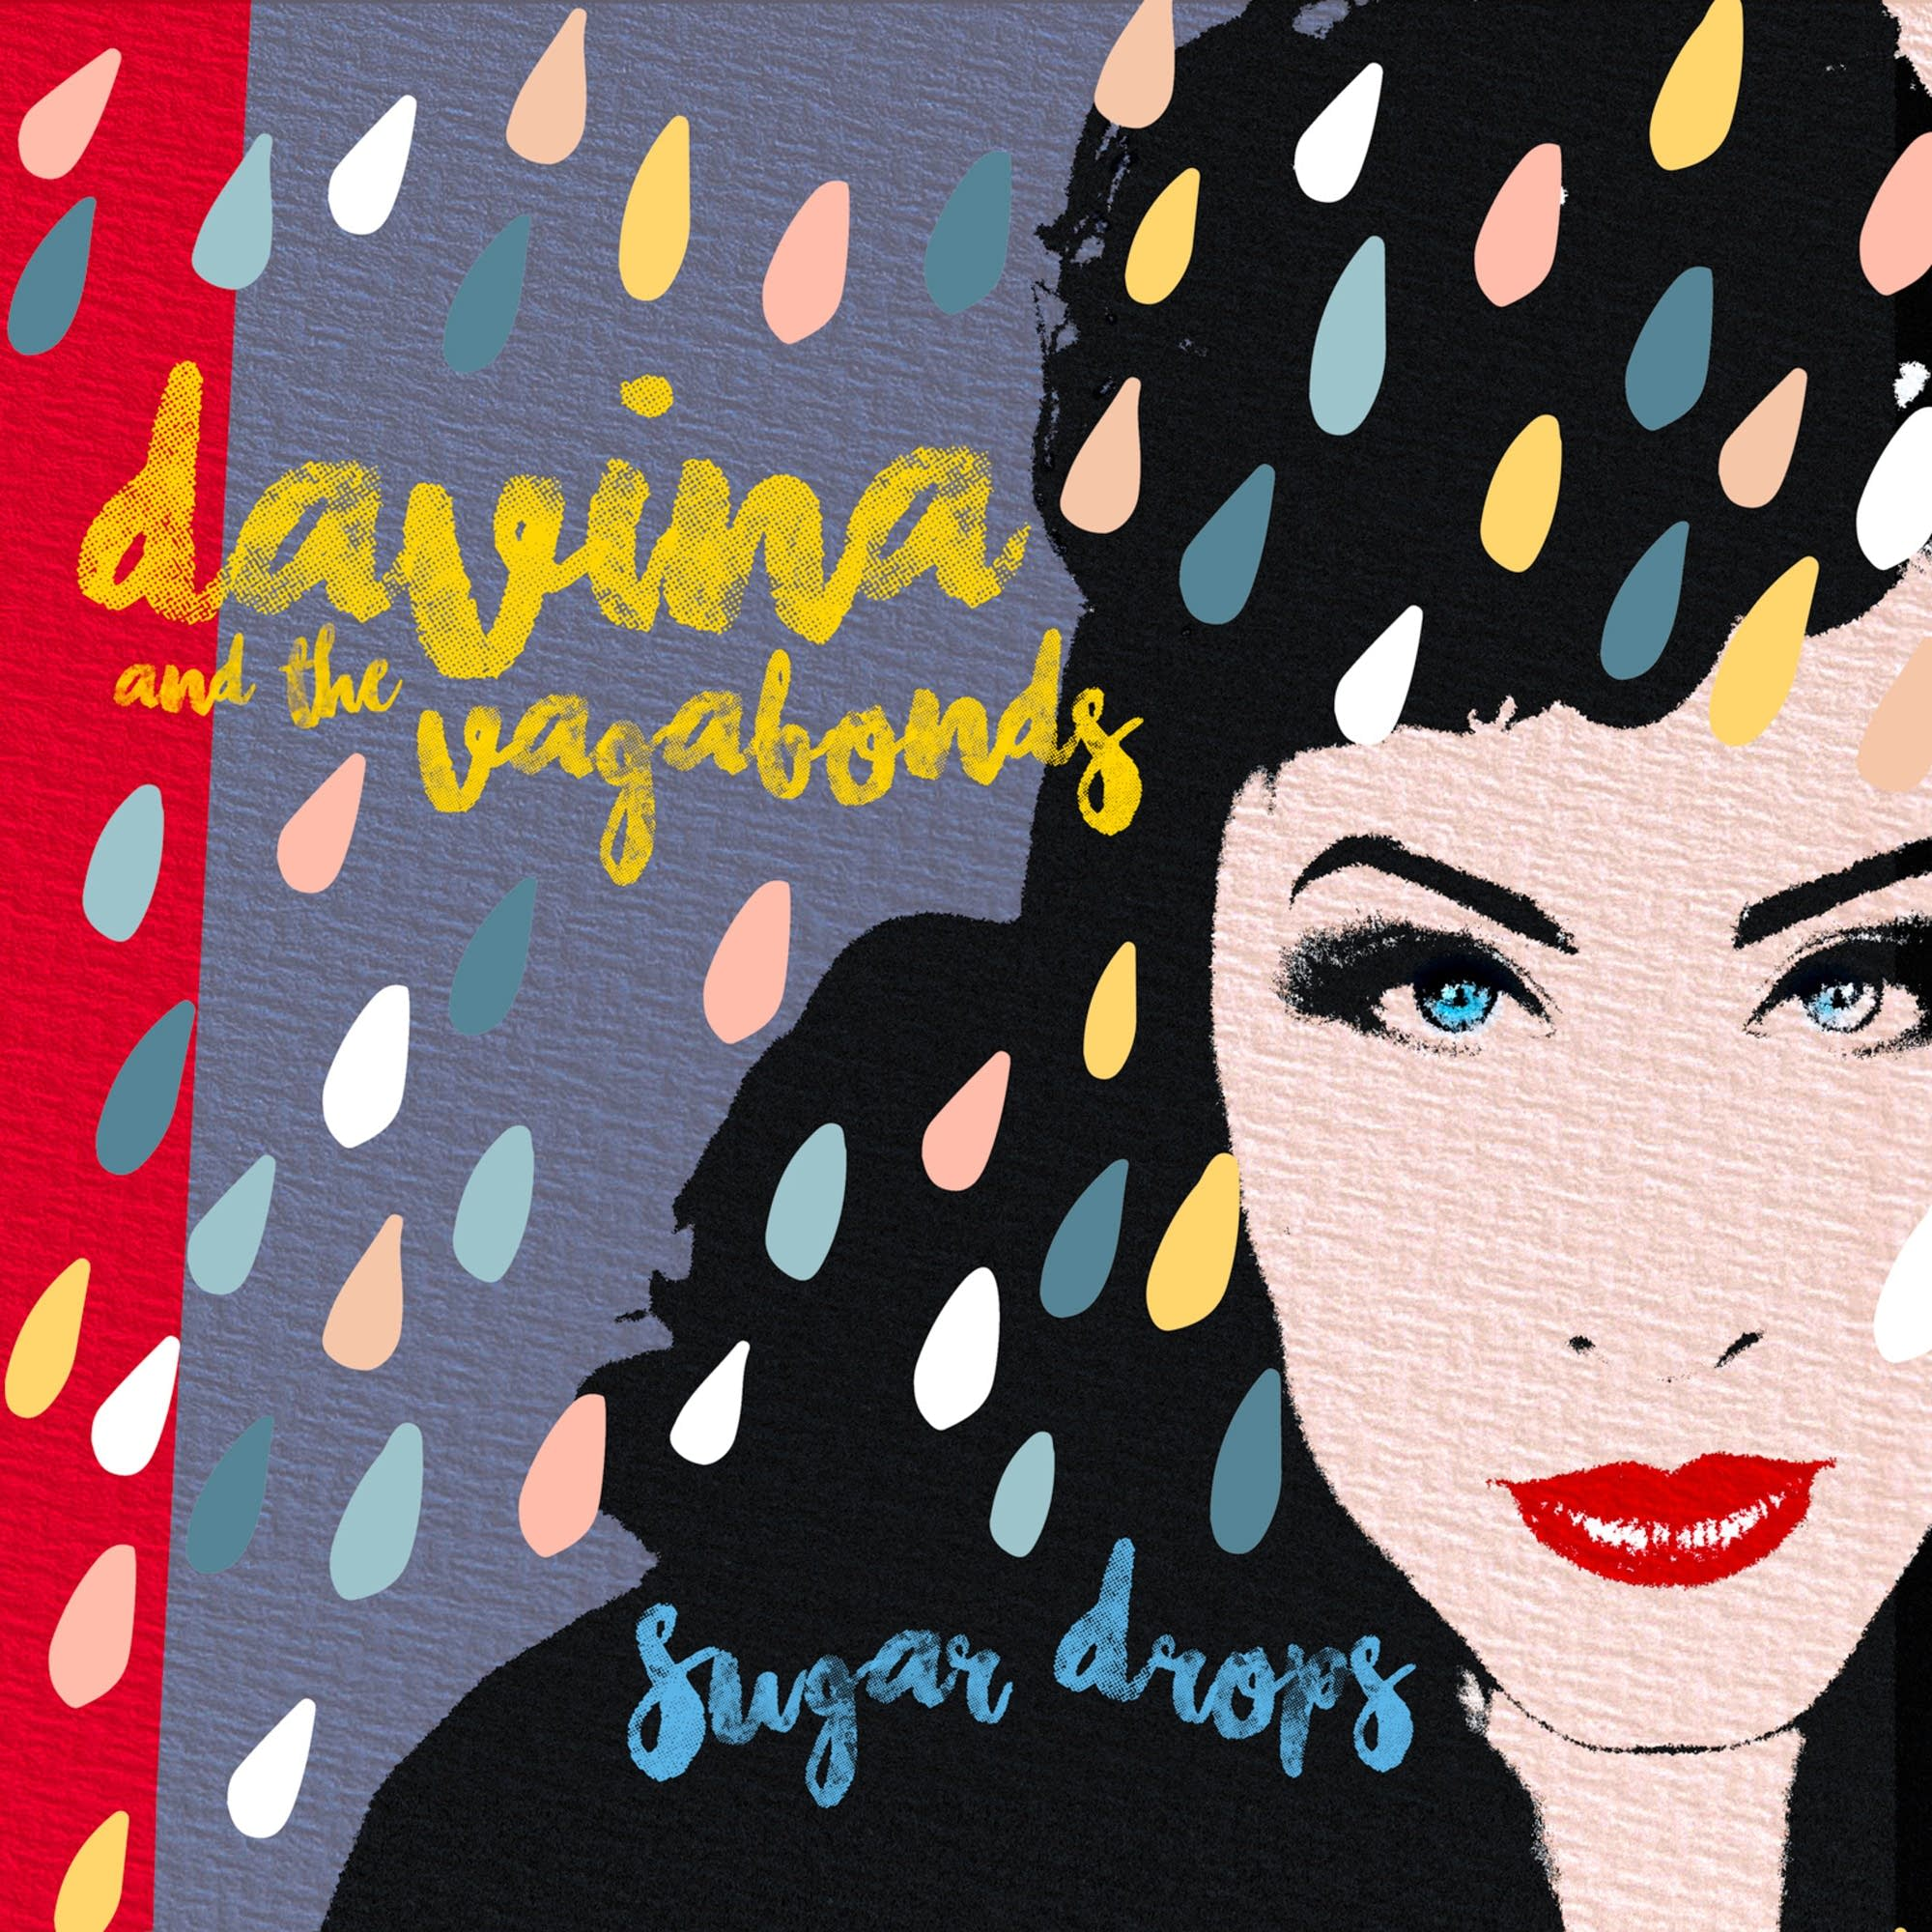 Davina and the Vagabonds - Sugar Drops